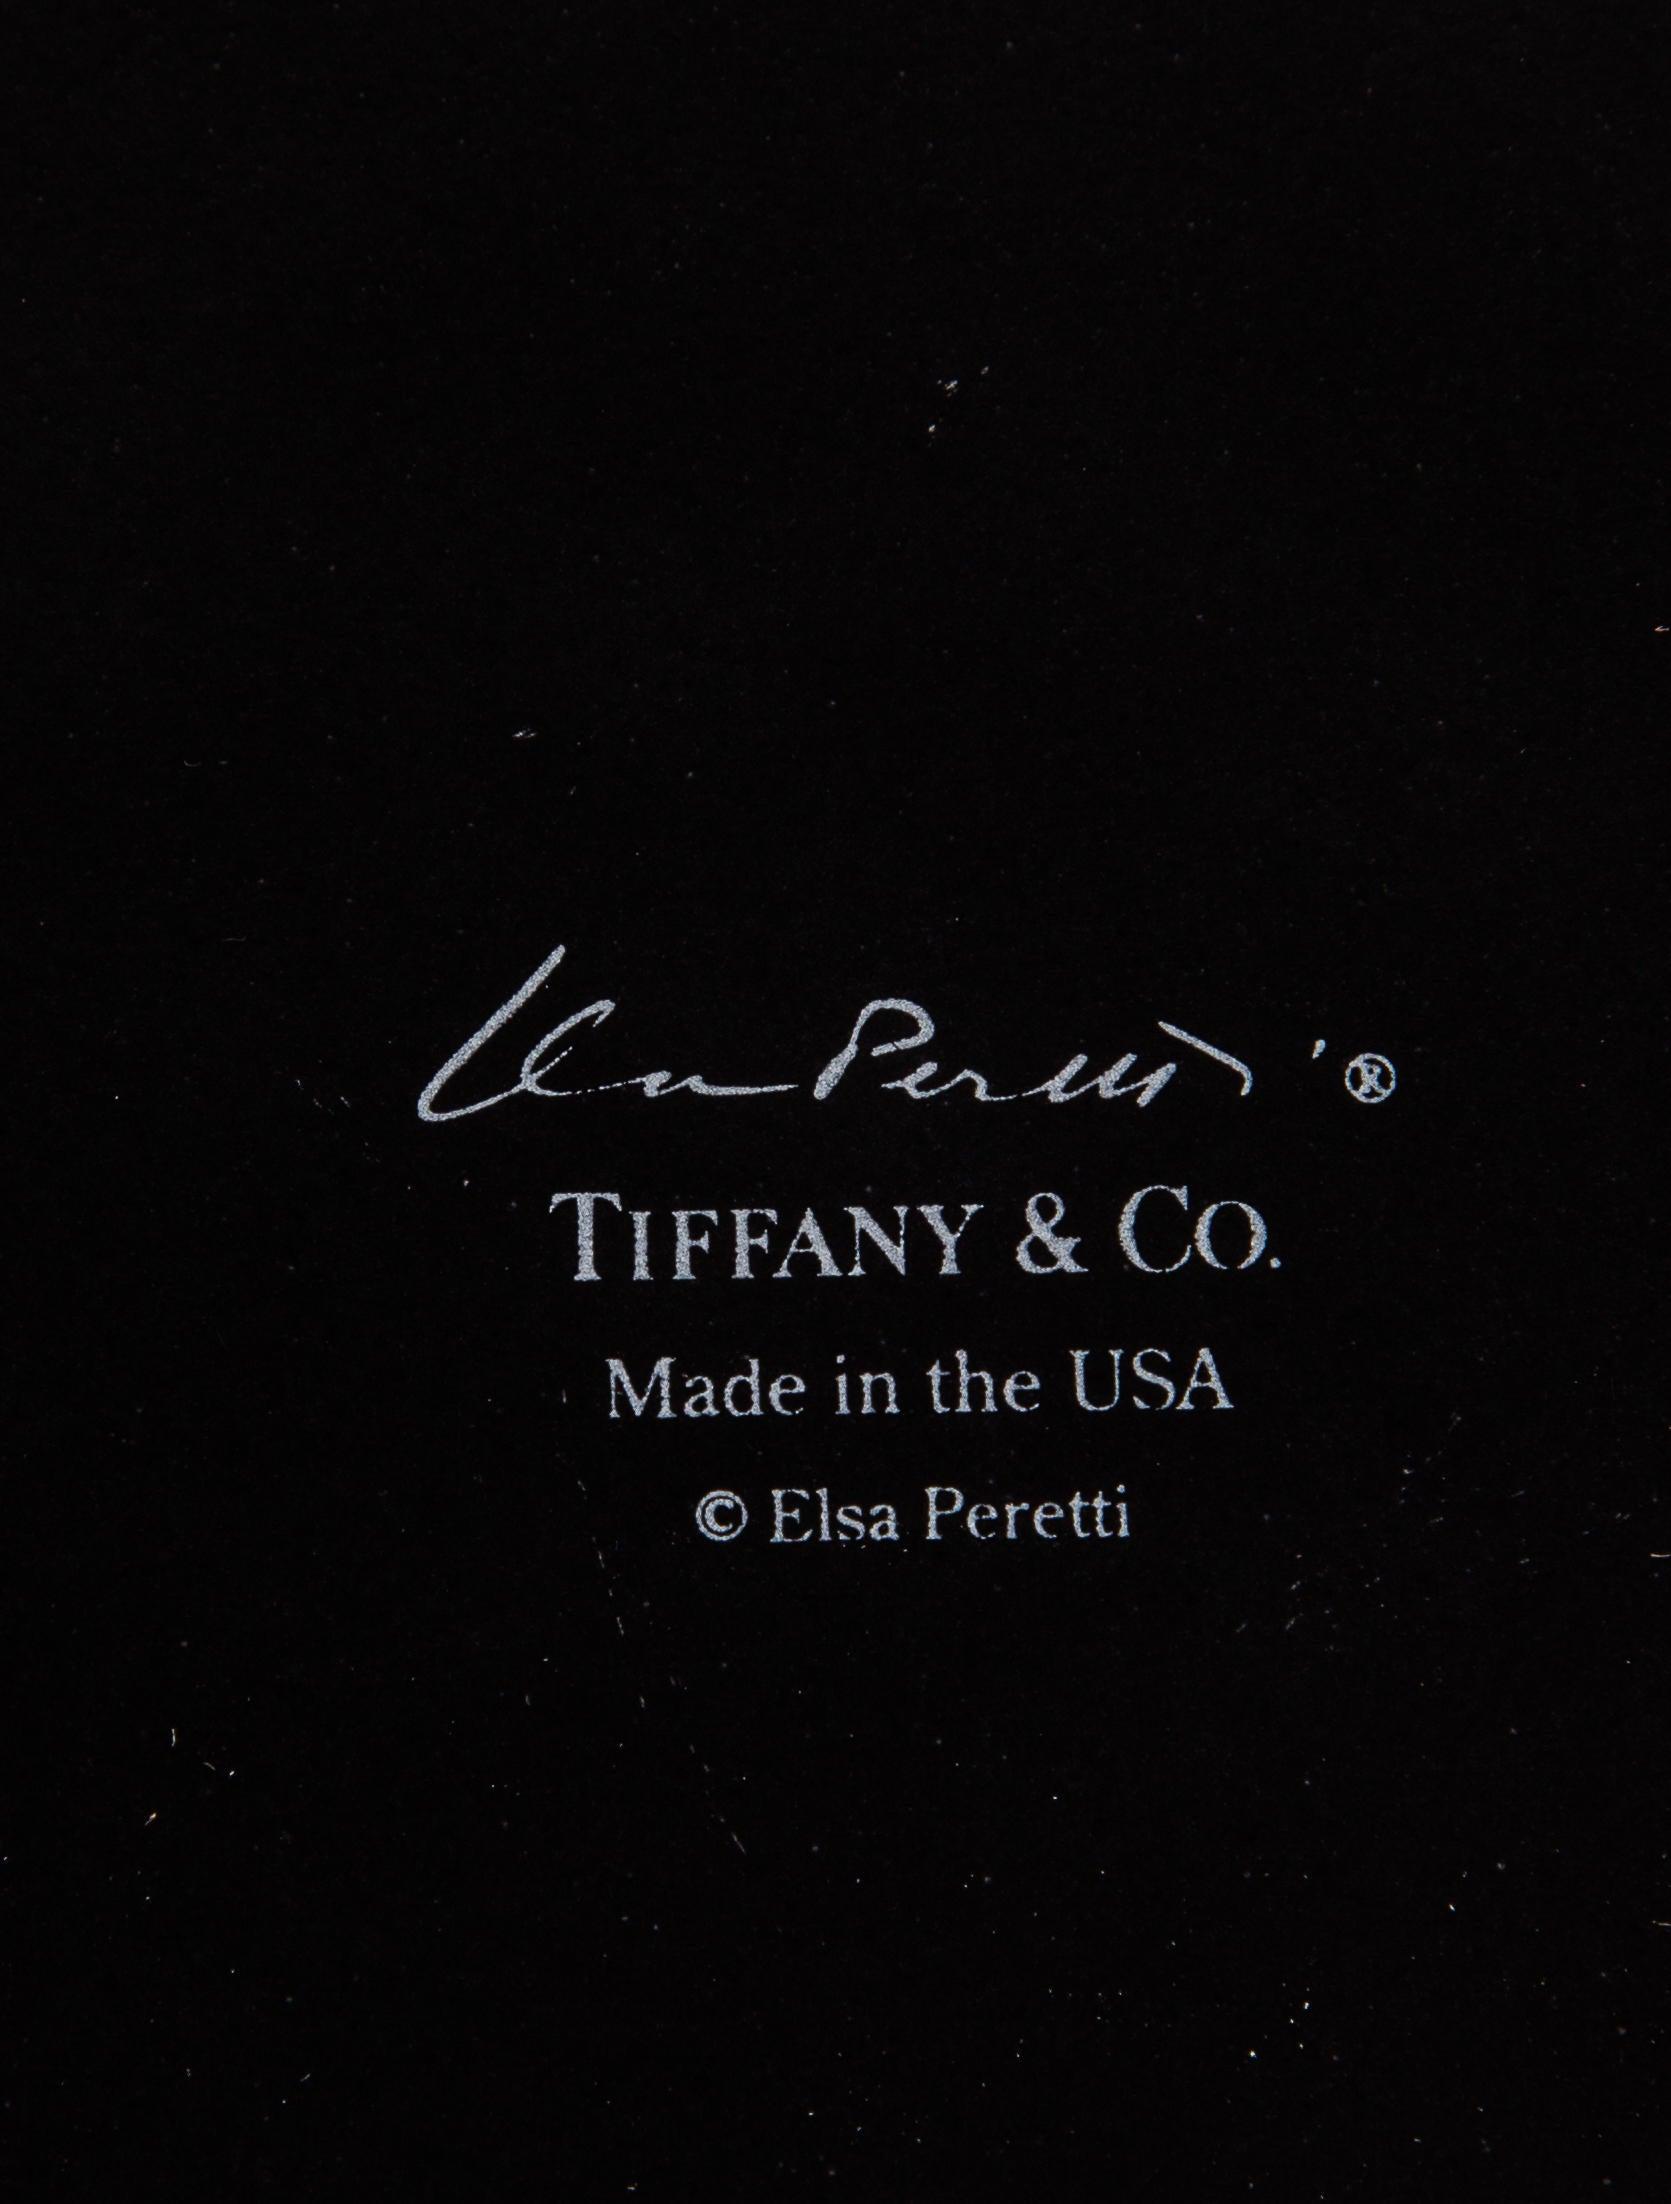 Tiffany Amp Co Elsa Peretti Thumbprint Bowl Tabletop And